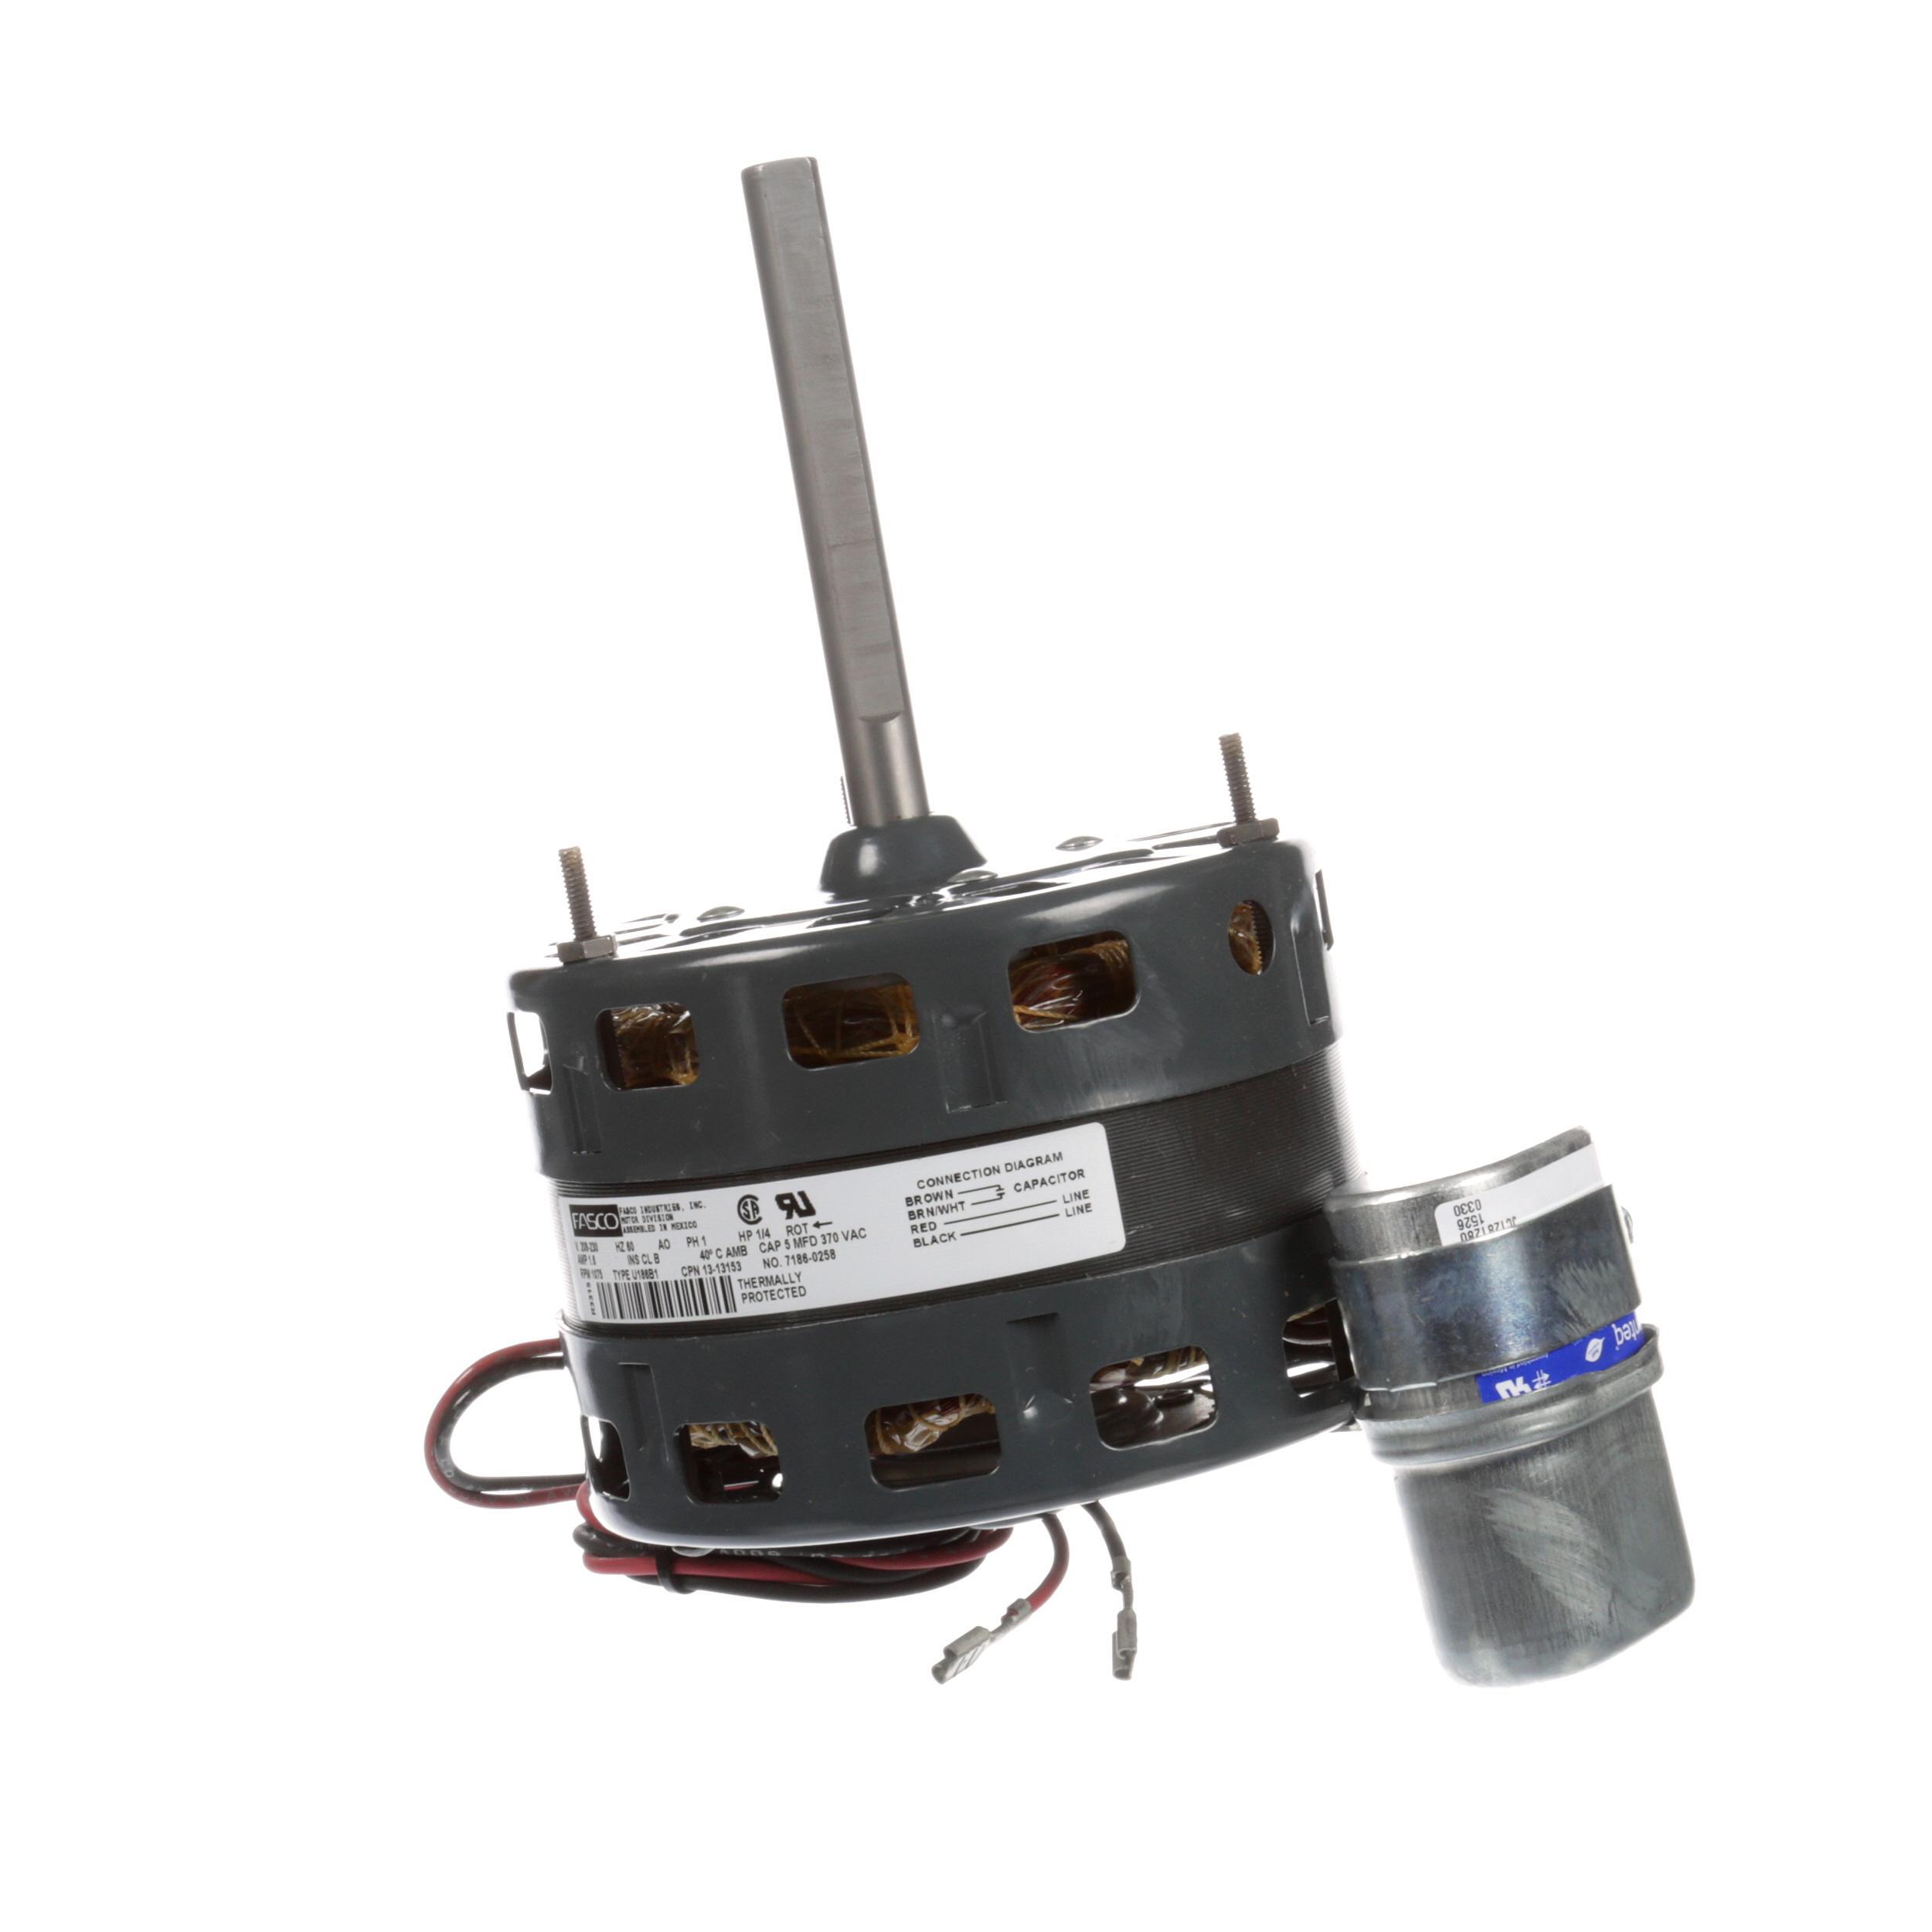 Master Bilt Condenser Fan Motor 7186 025 Part 13 13153 Twin City Wiring Diagram